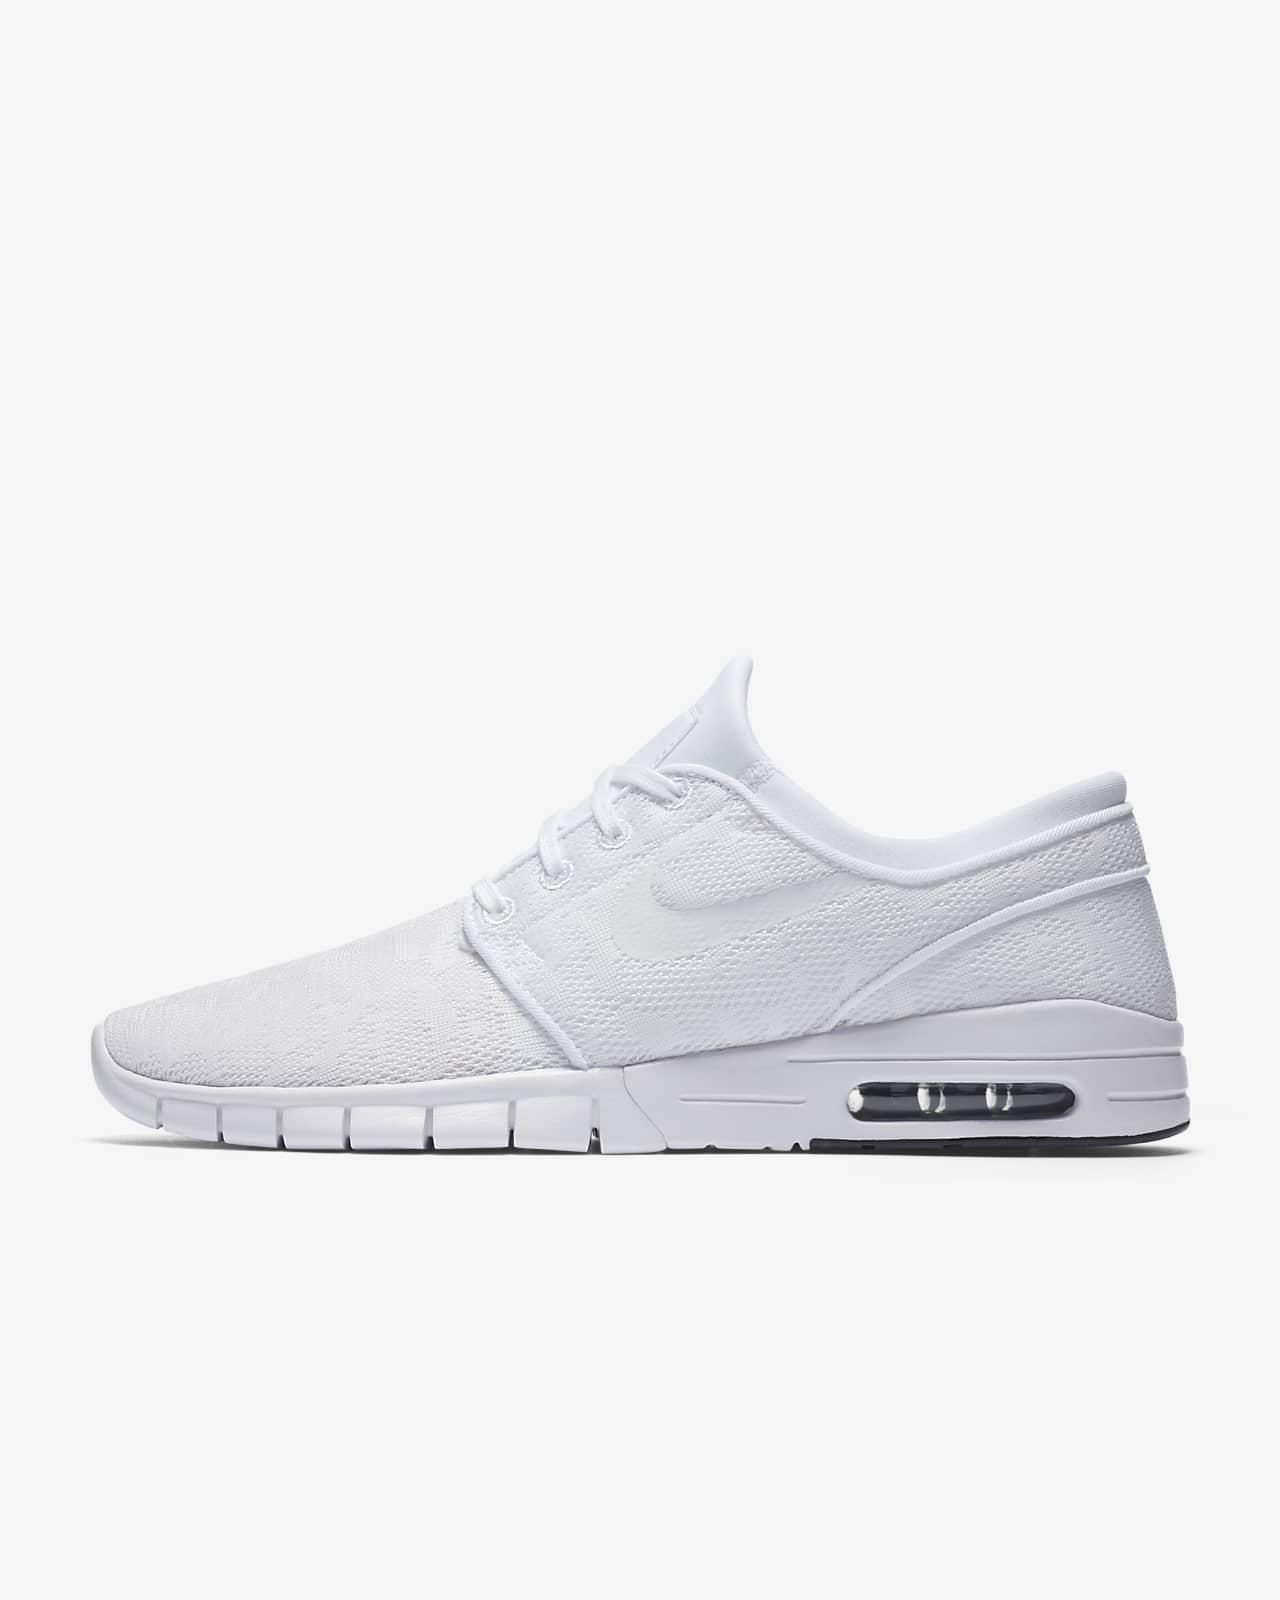 Chaussure de skateboard Nike SB Stefan Janoski Max